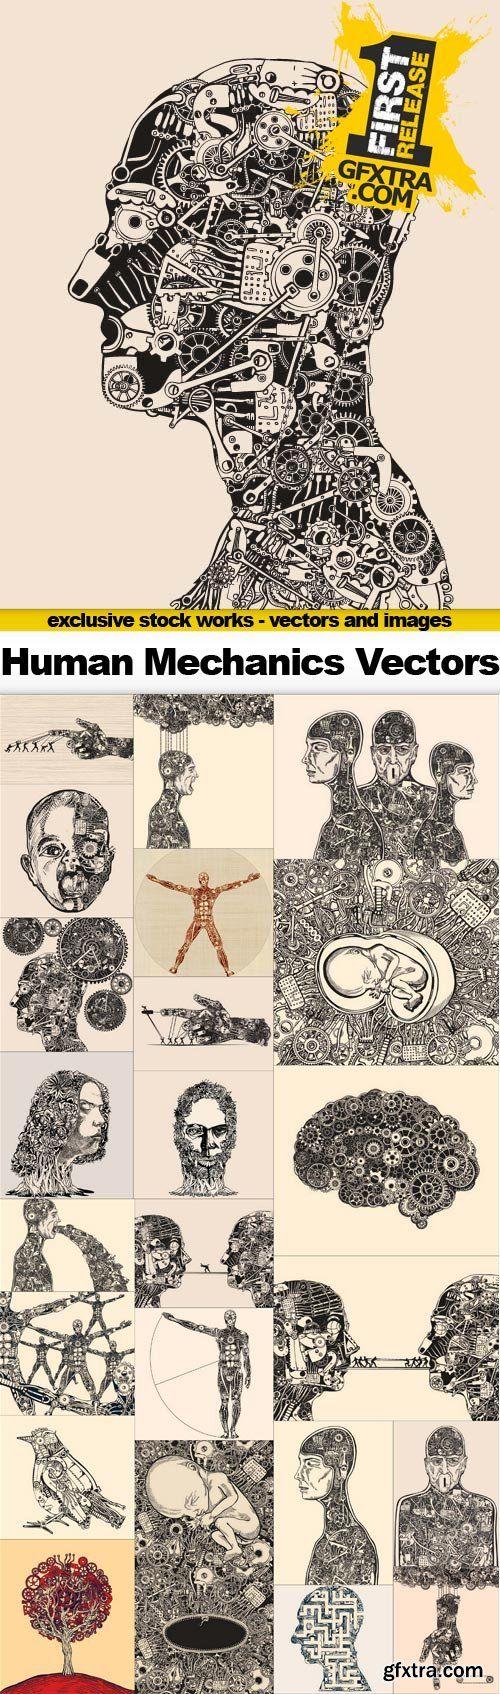 T shirt design 7 25xeps - T Shirt Design 7 25xeps Human Mechanics 25x Eps Download